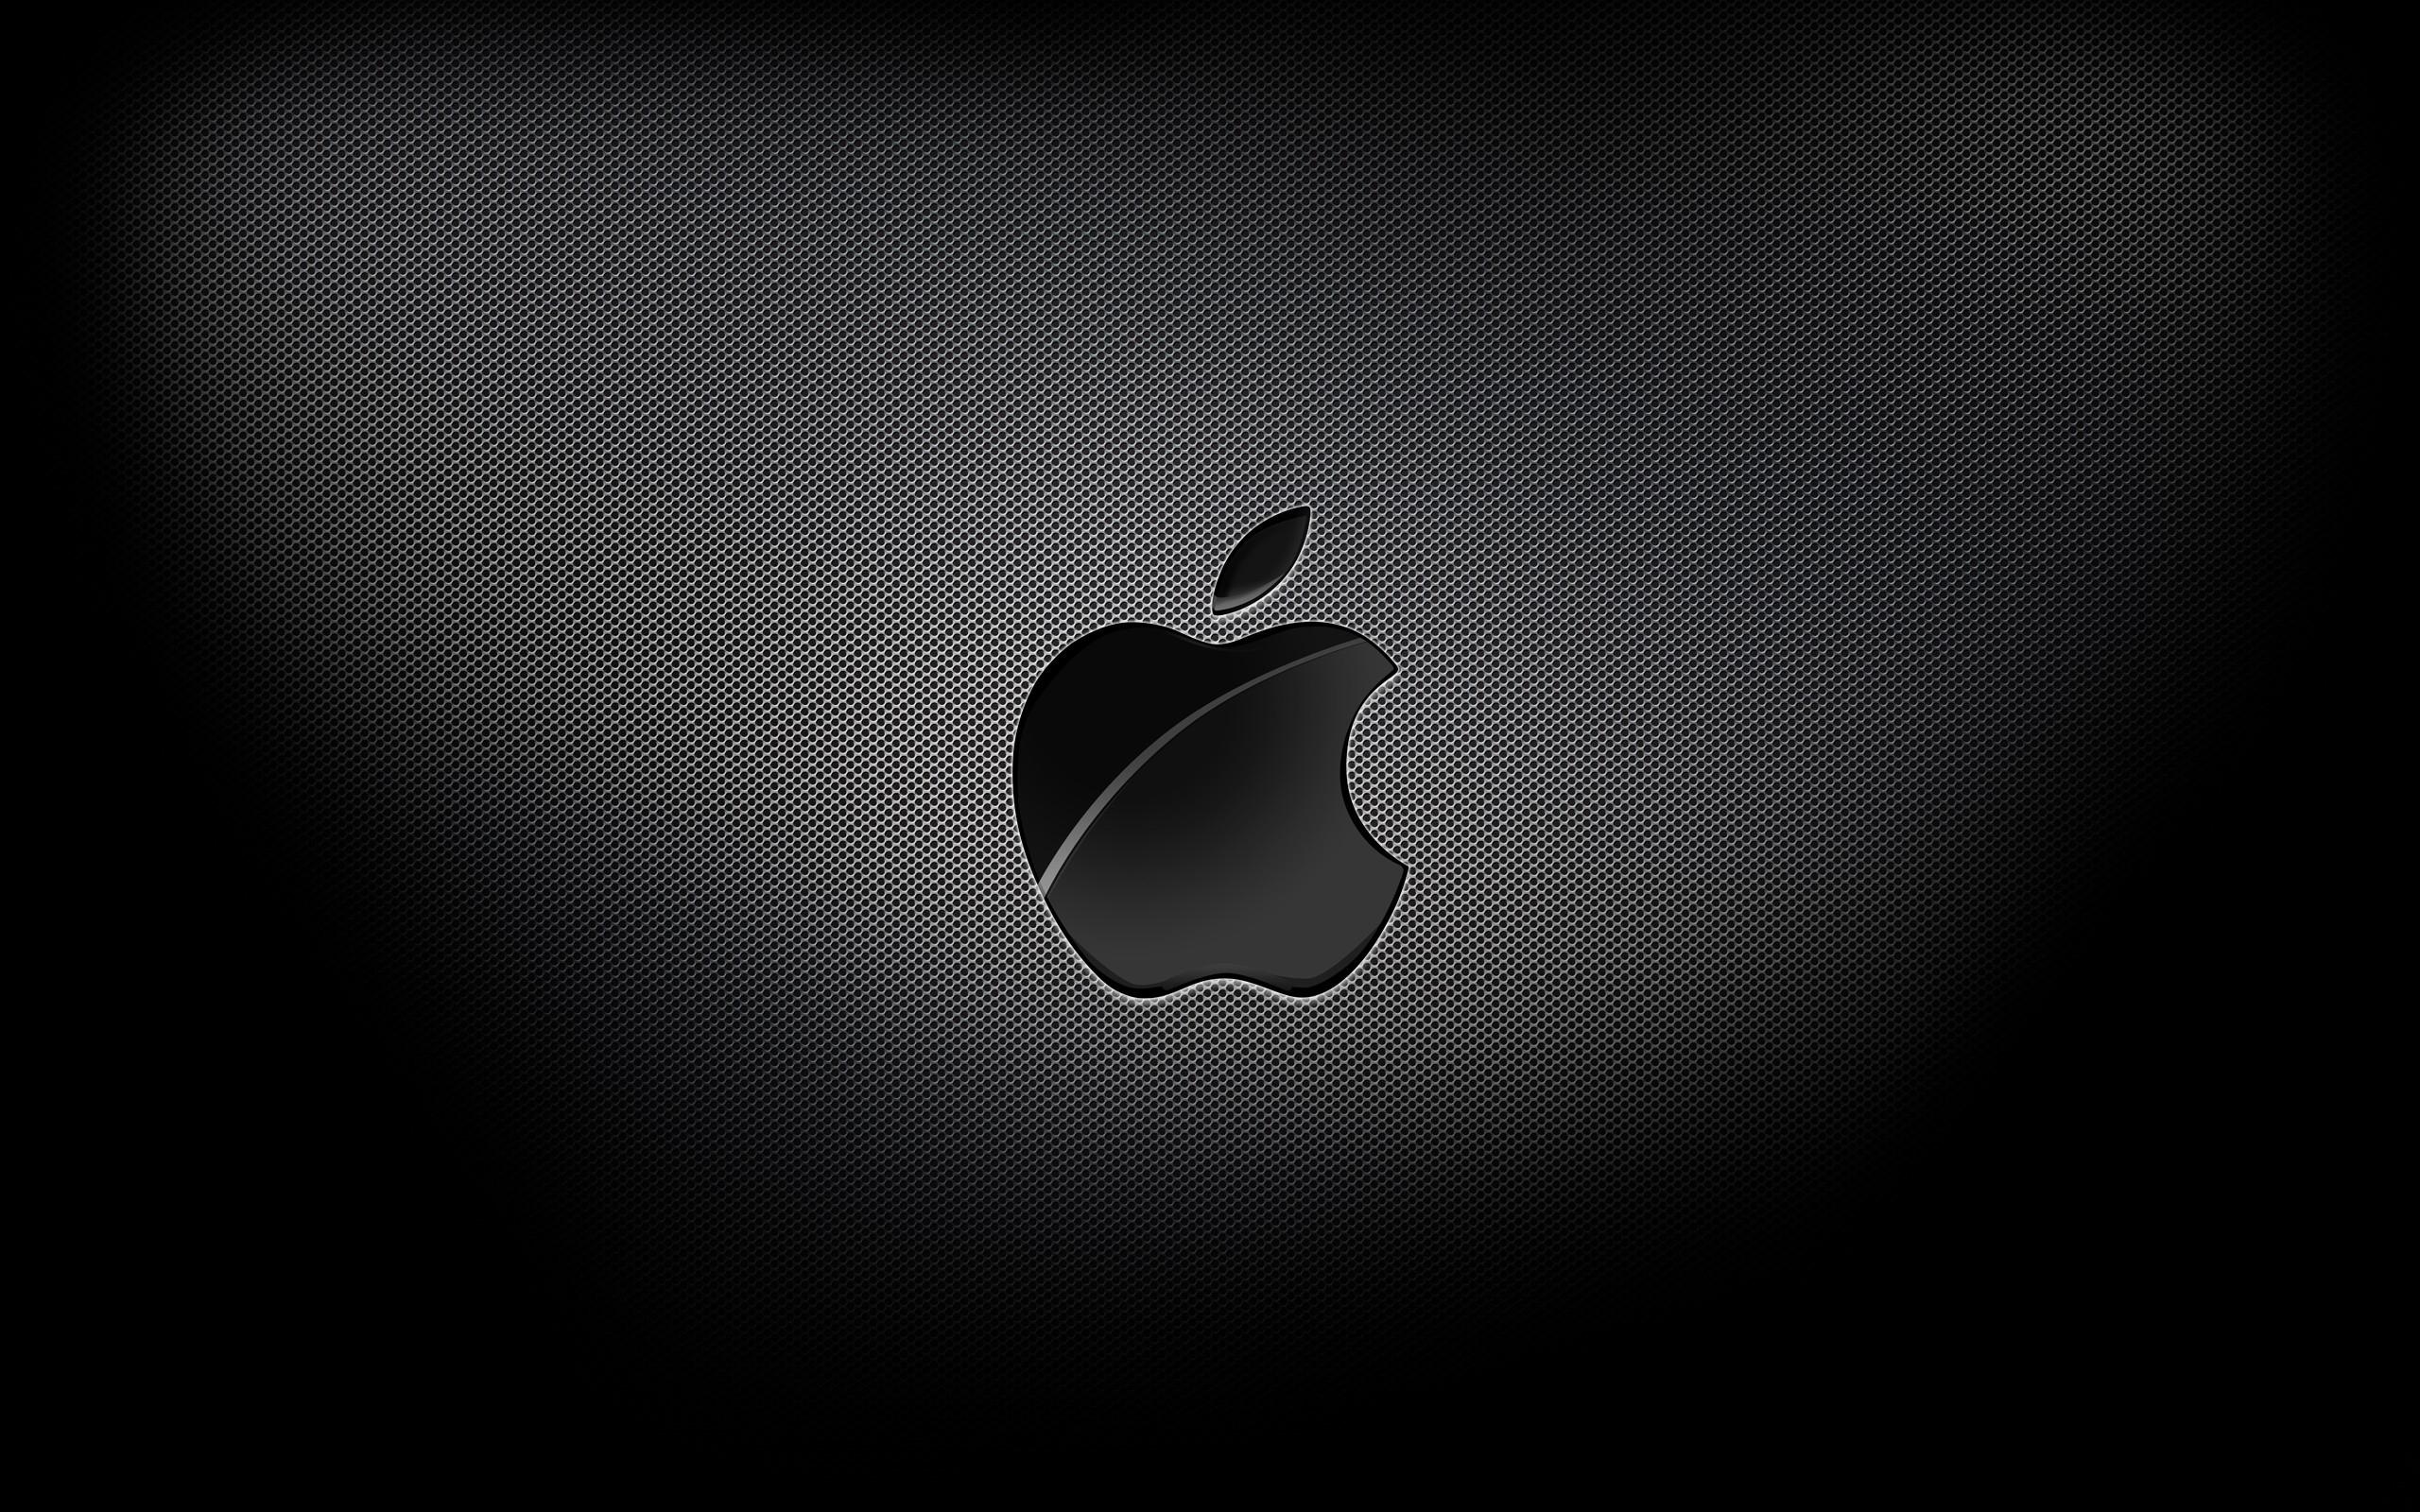 Fantastic Wallpaper Macbook Light - apple-mac-brand-logo-dark-light-shadow-1073141  Graphic_424016.jpg